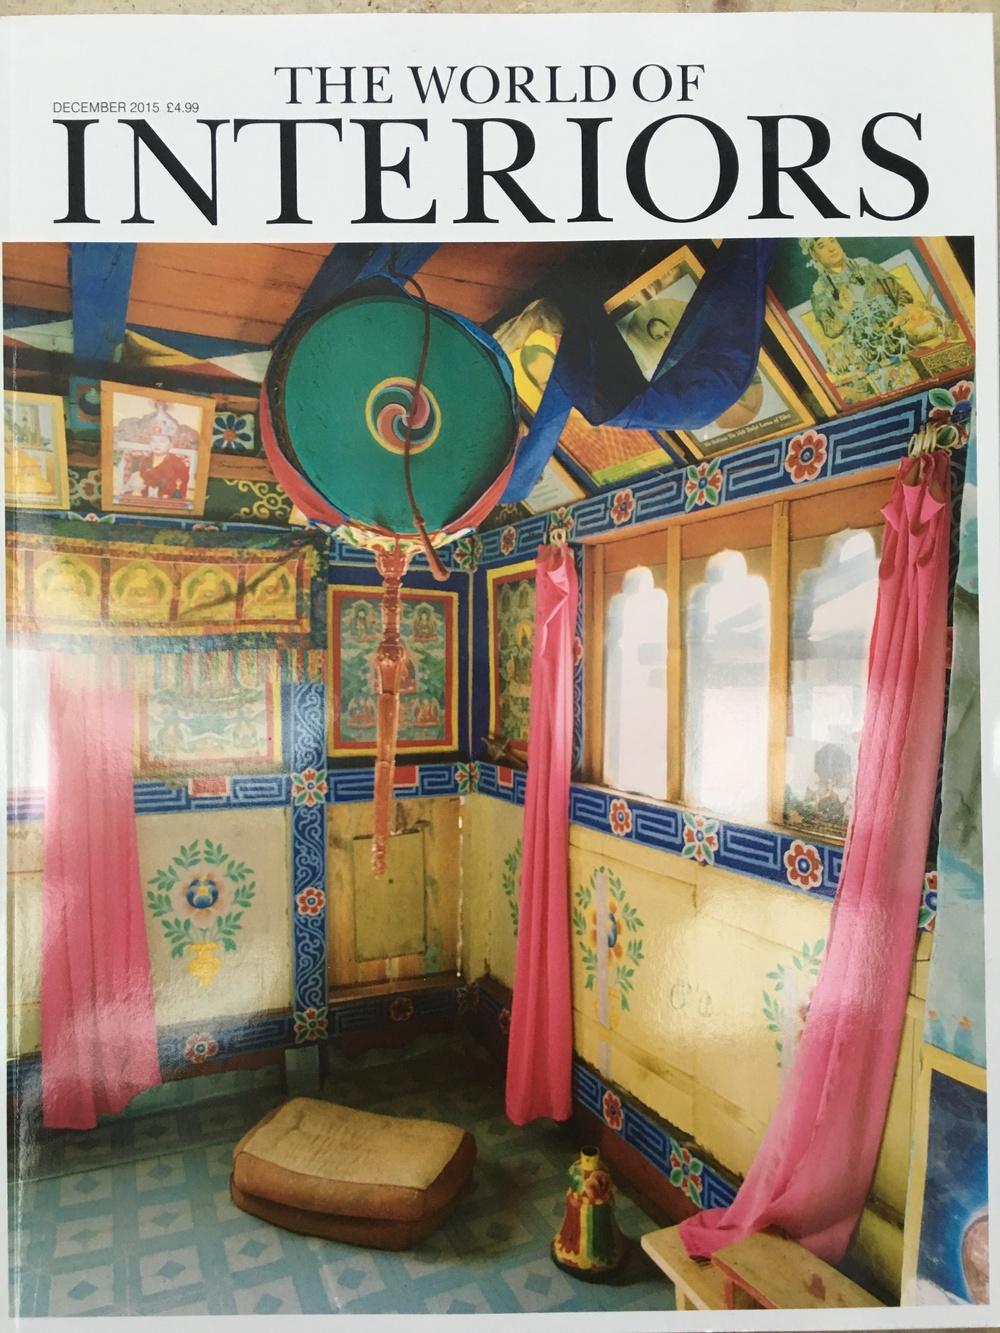 The World of Interiors December 2015